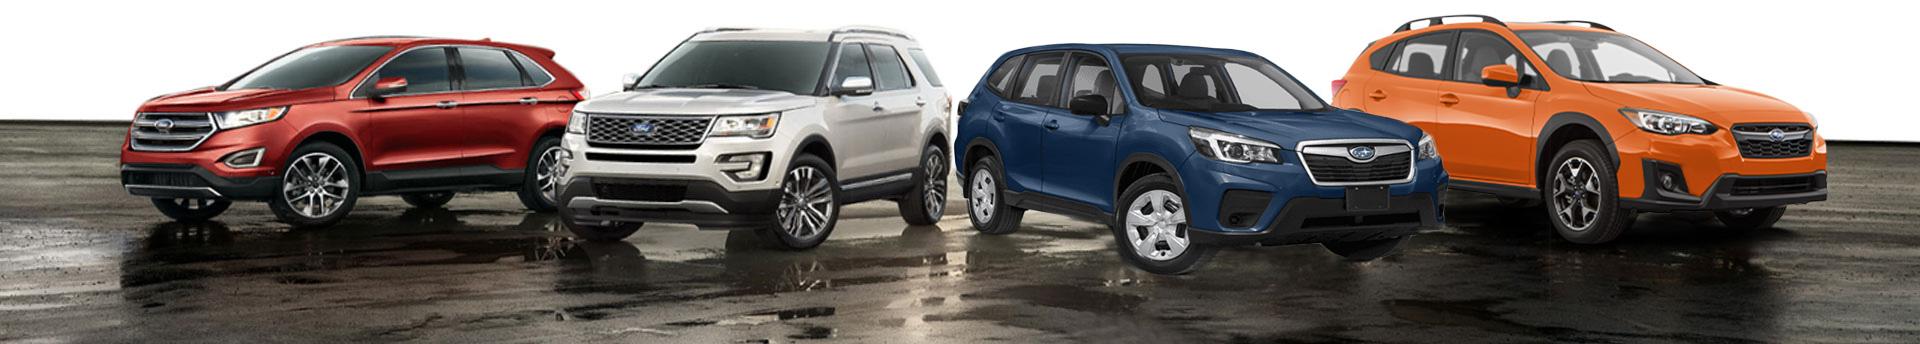 a fleet of Subaru vehicles